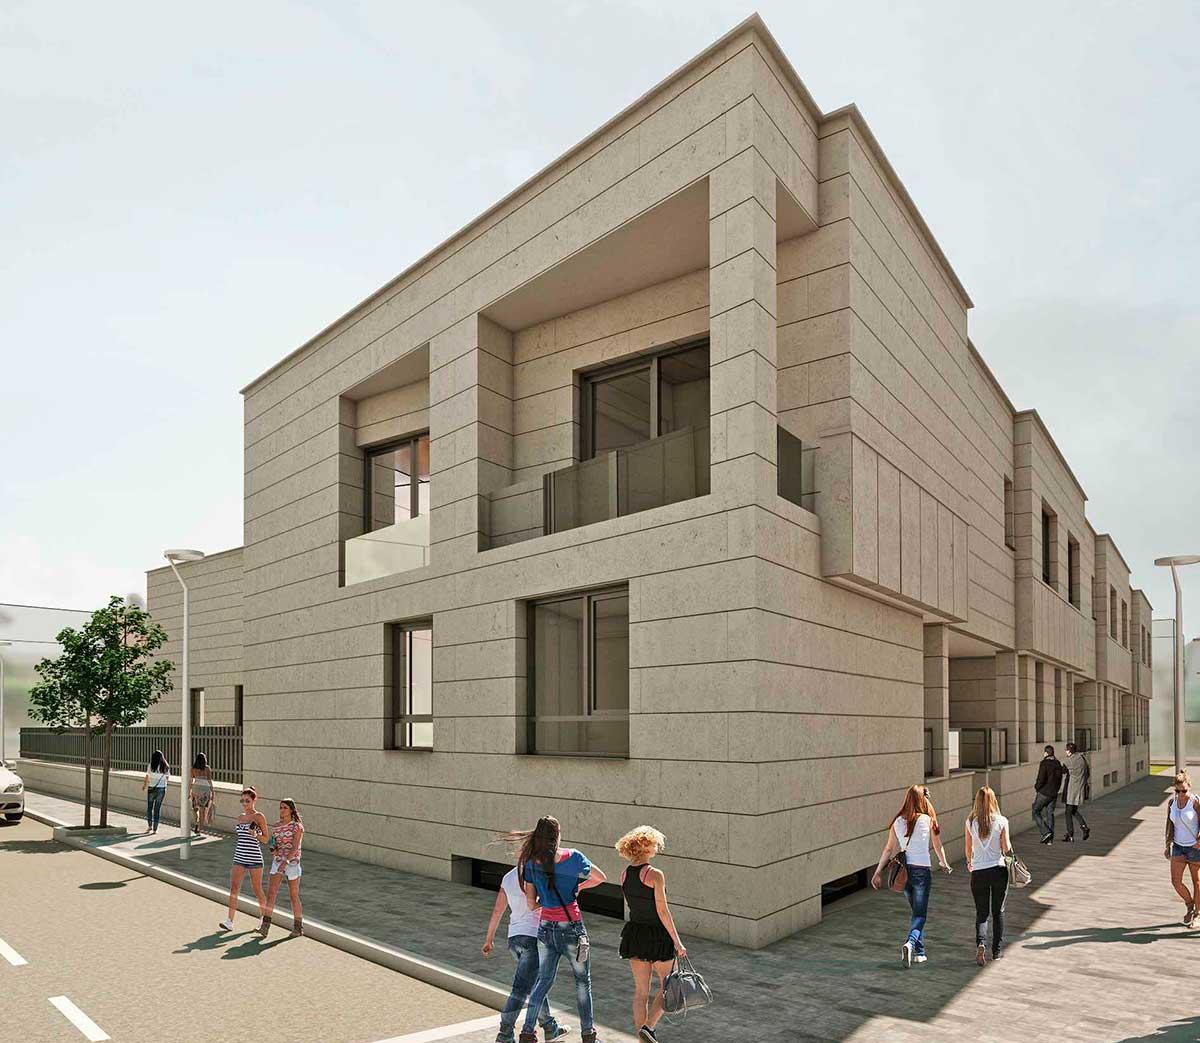 vivienda unifamiliar vivienda 4 chalet adosado con terraza en Arroyo de la Encomienda